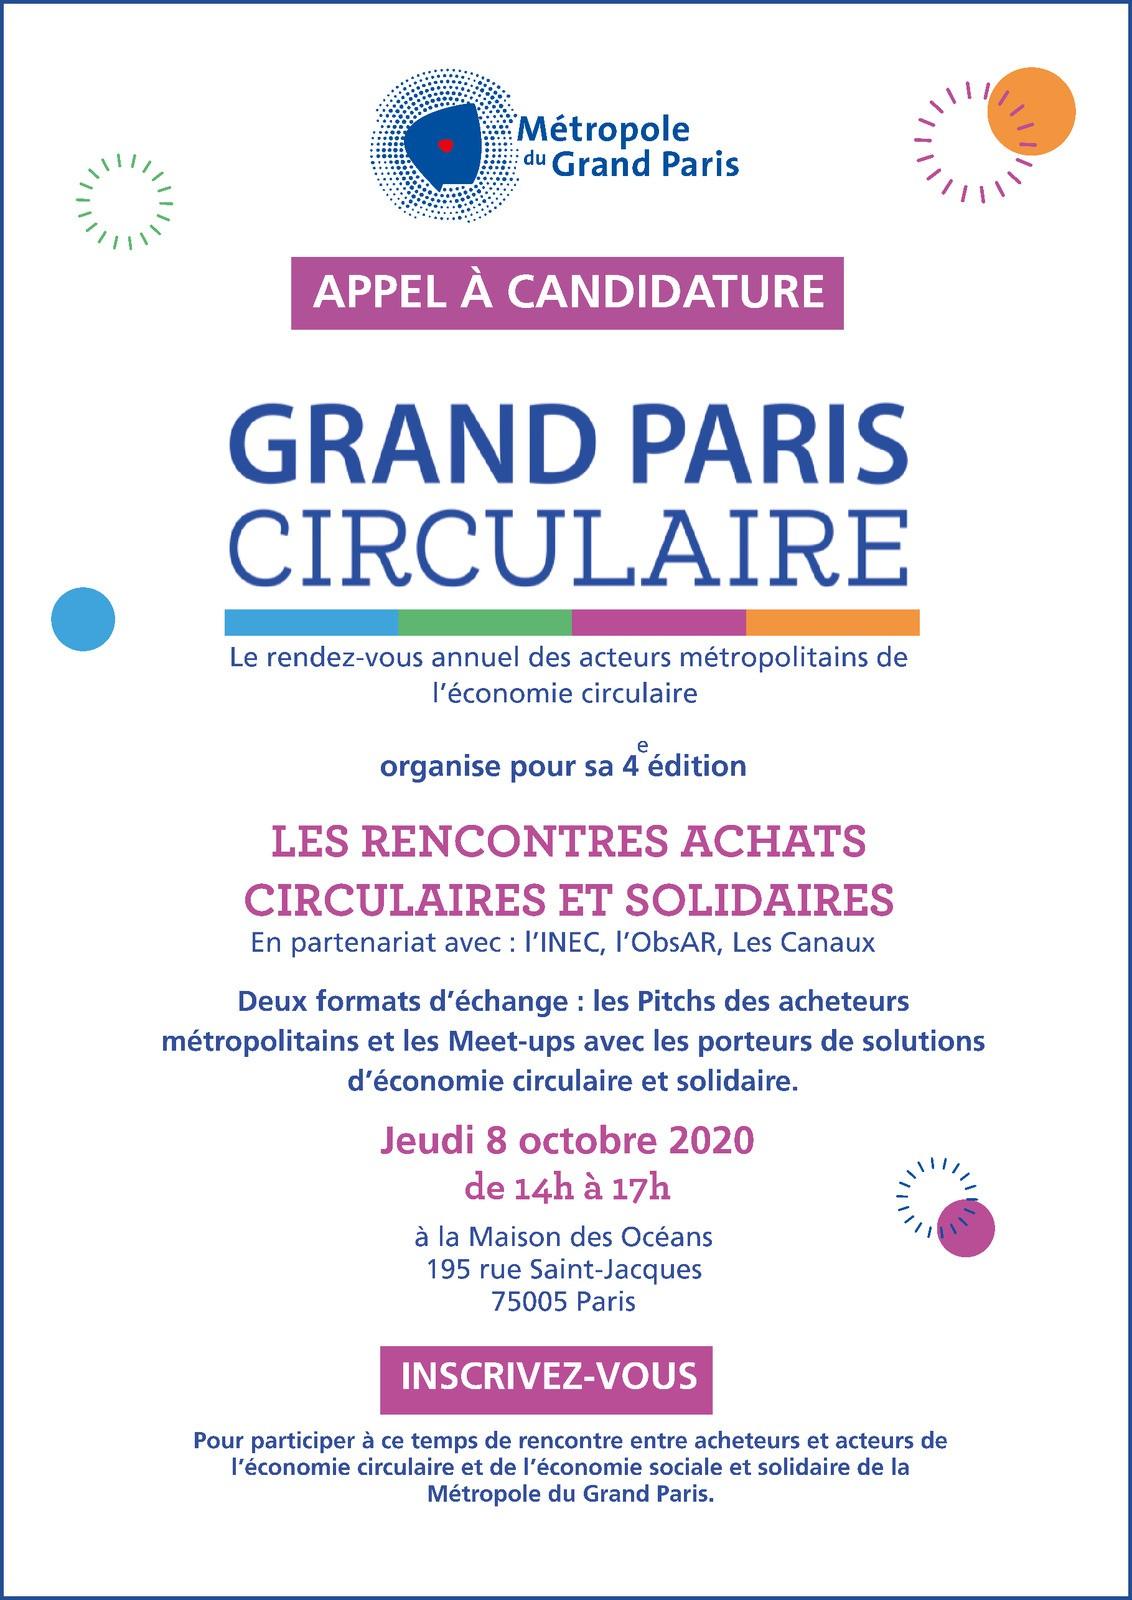 Appel à candidature - Les Rencontres Achats Circulaires et Solidaires, jeudi 8 octobre 2020